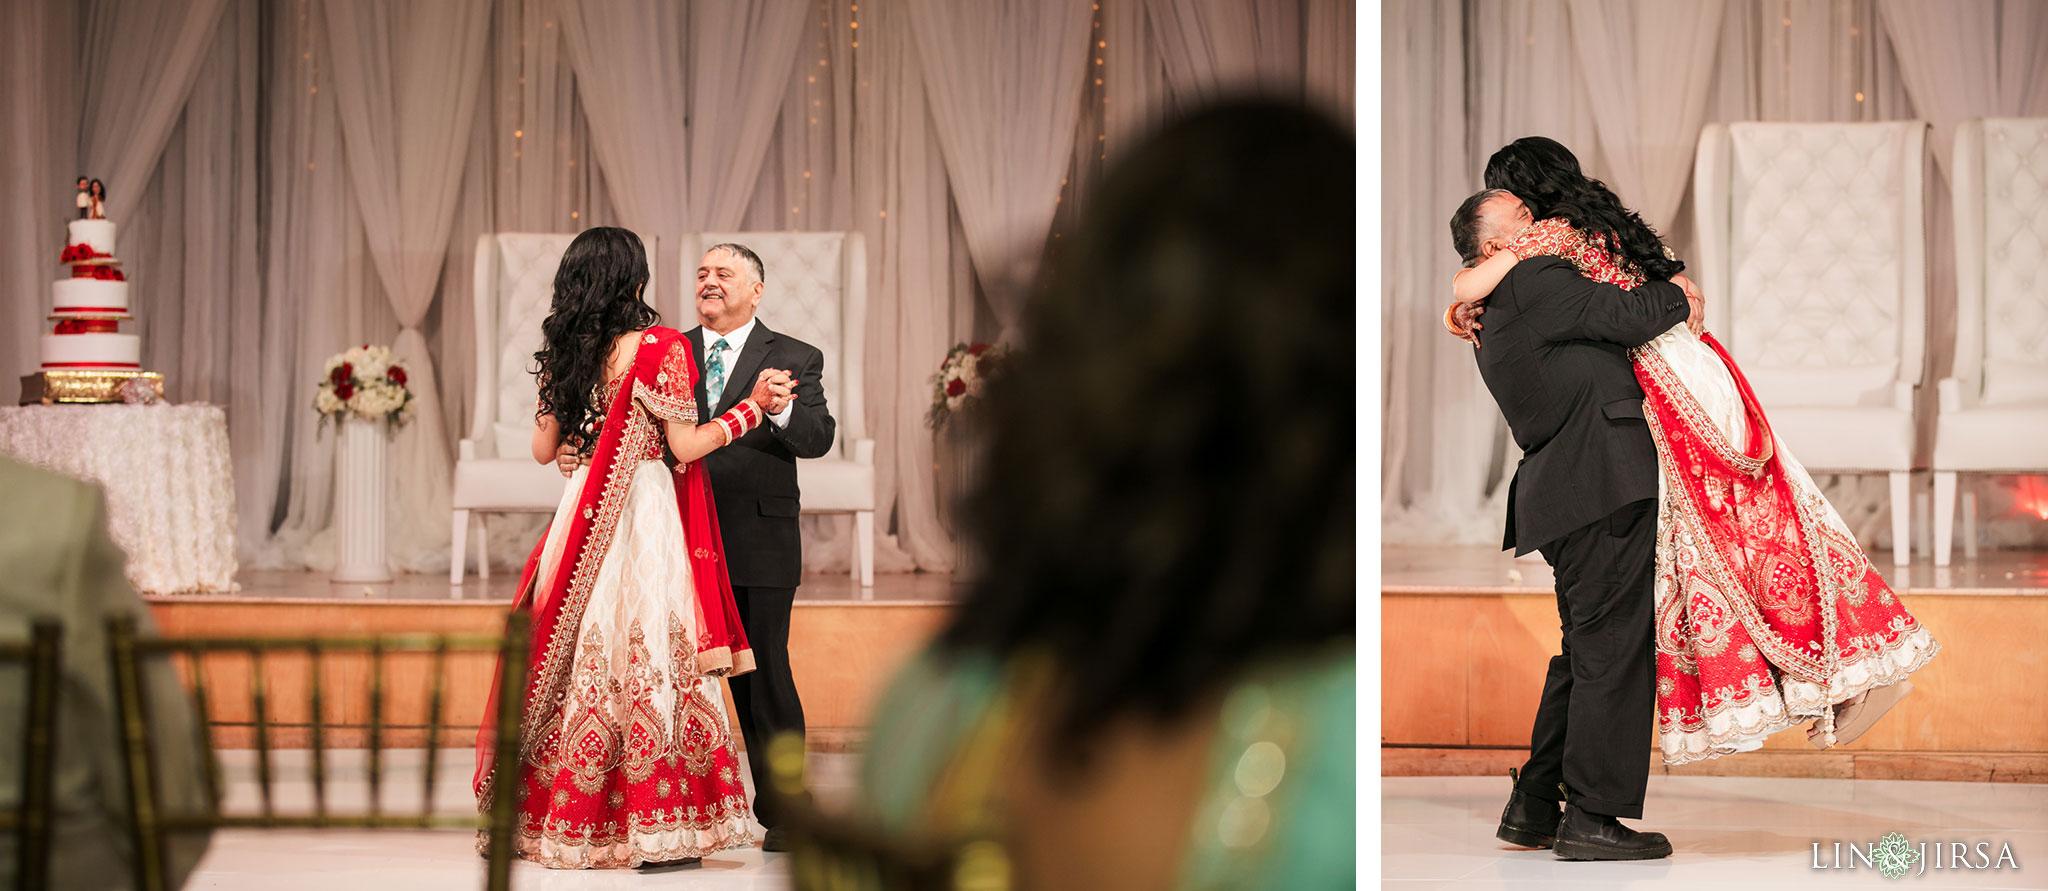 37 Diamond Bar Center Inland Empire Indian Wedding Photography